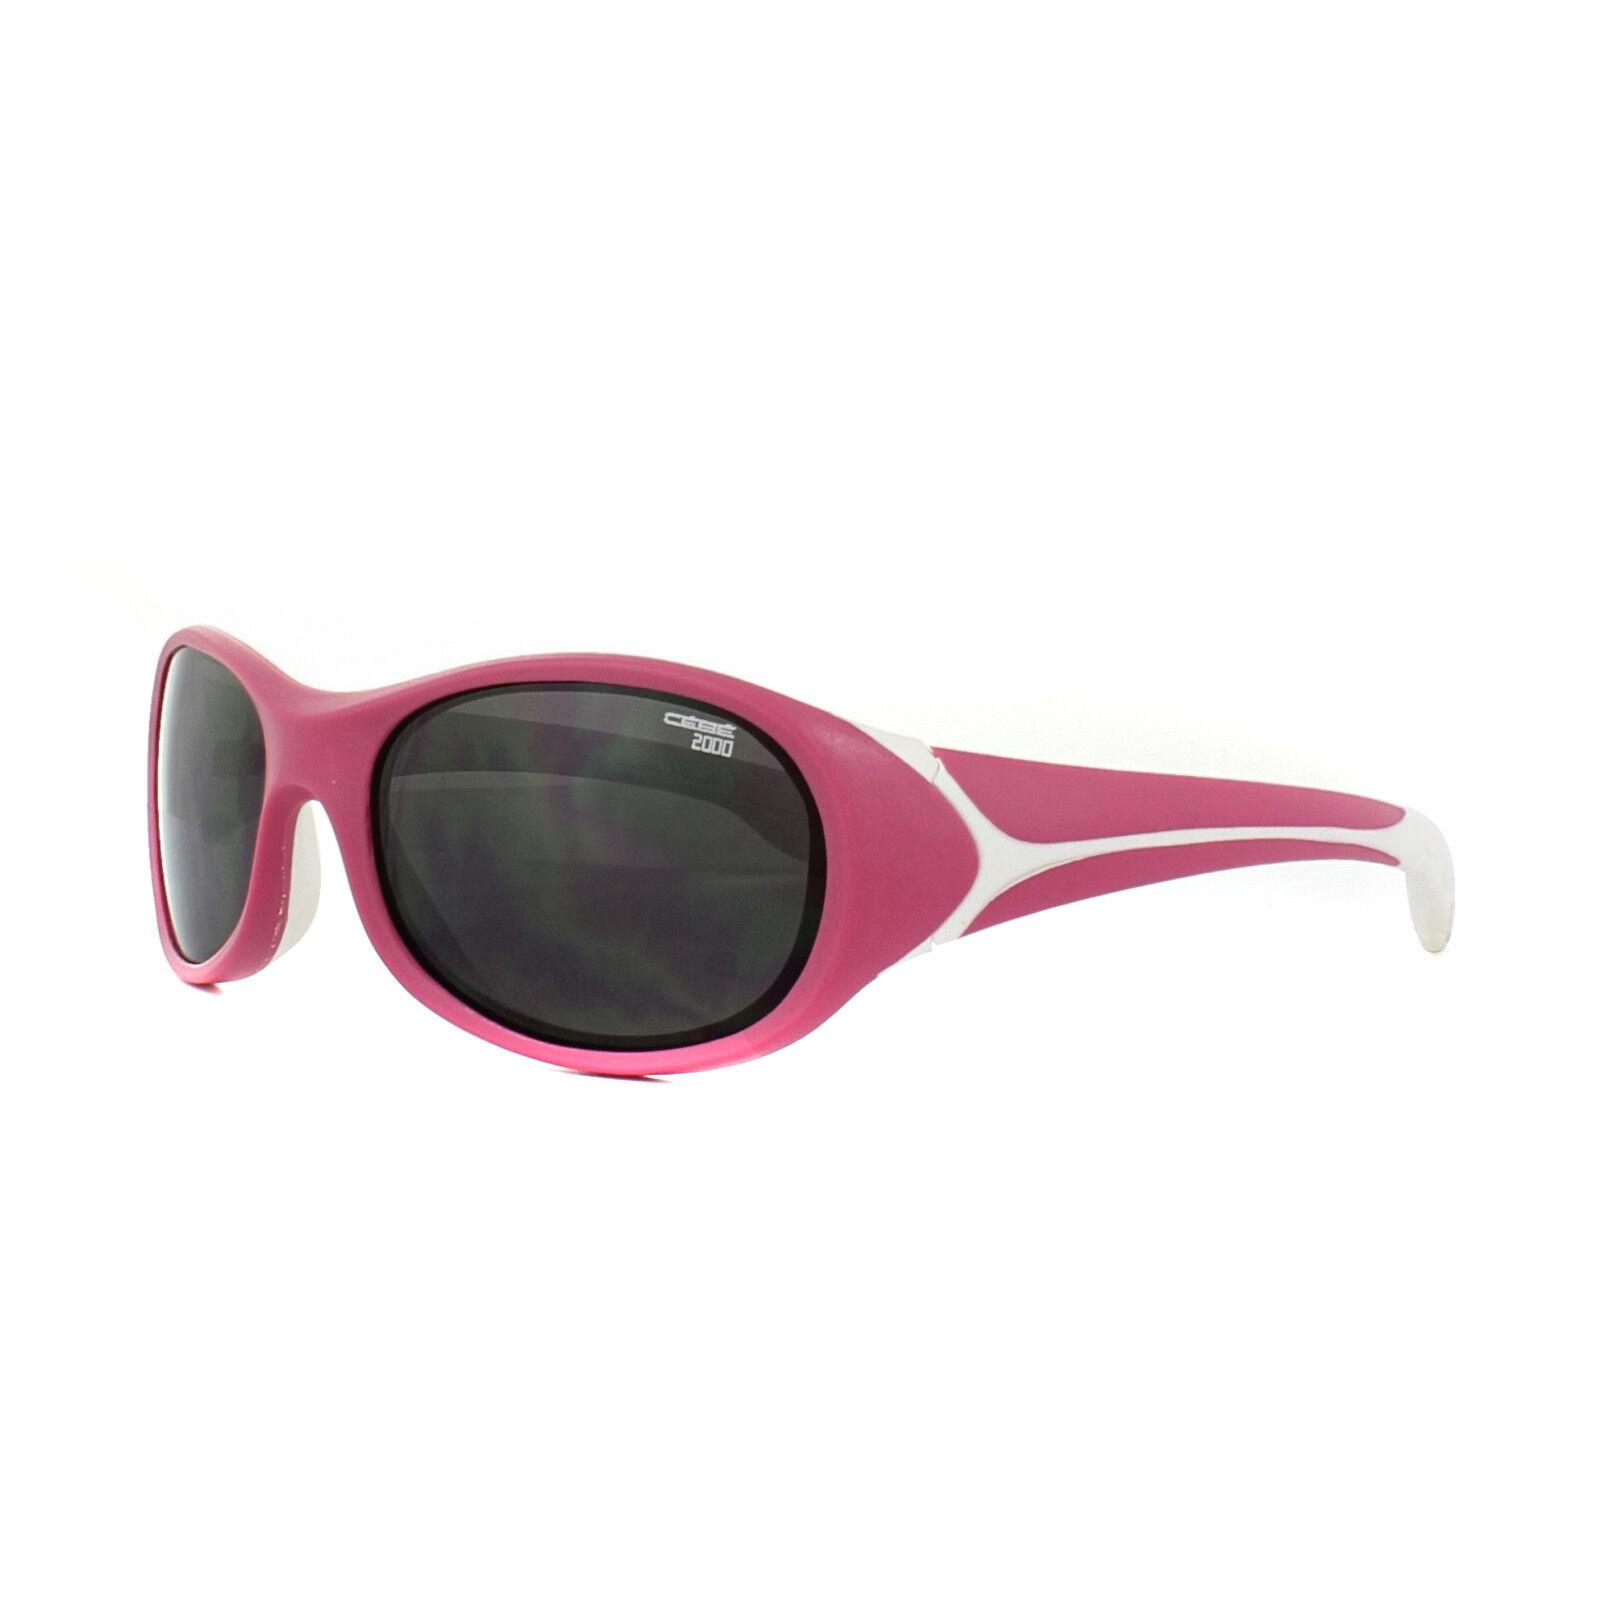 6933c41dff1 Buy CEBE Junior Sunglasses Flipper Cbflip2 Raspberry 2000 Grey ...